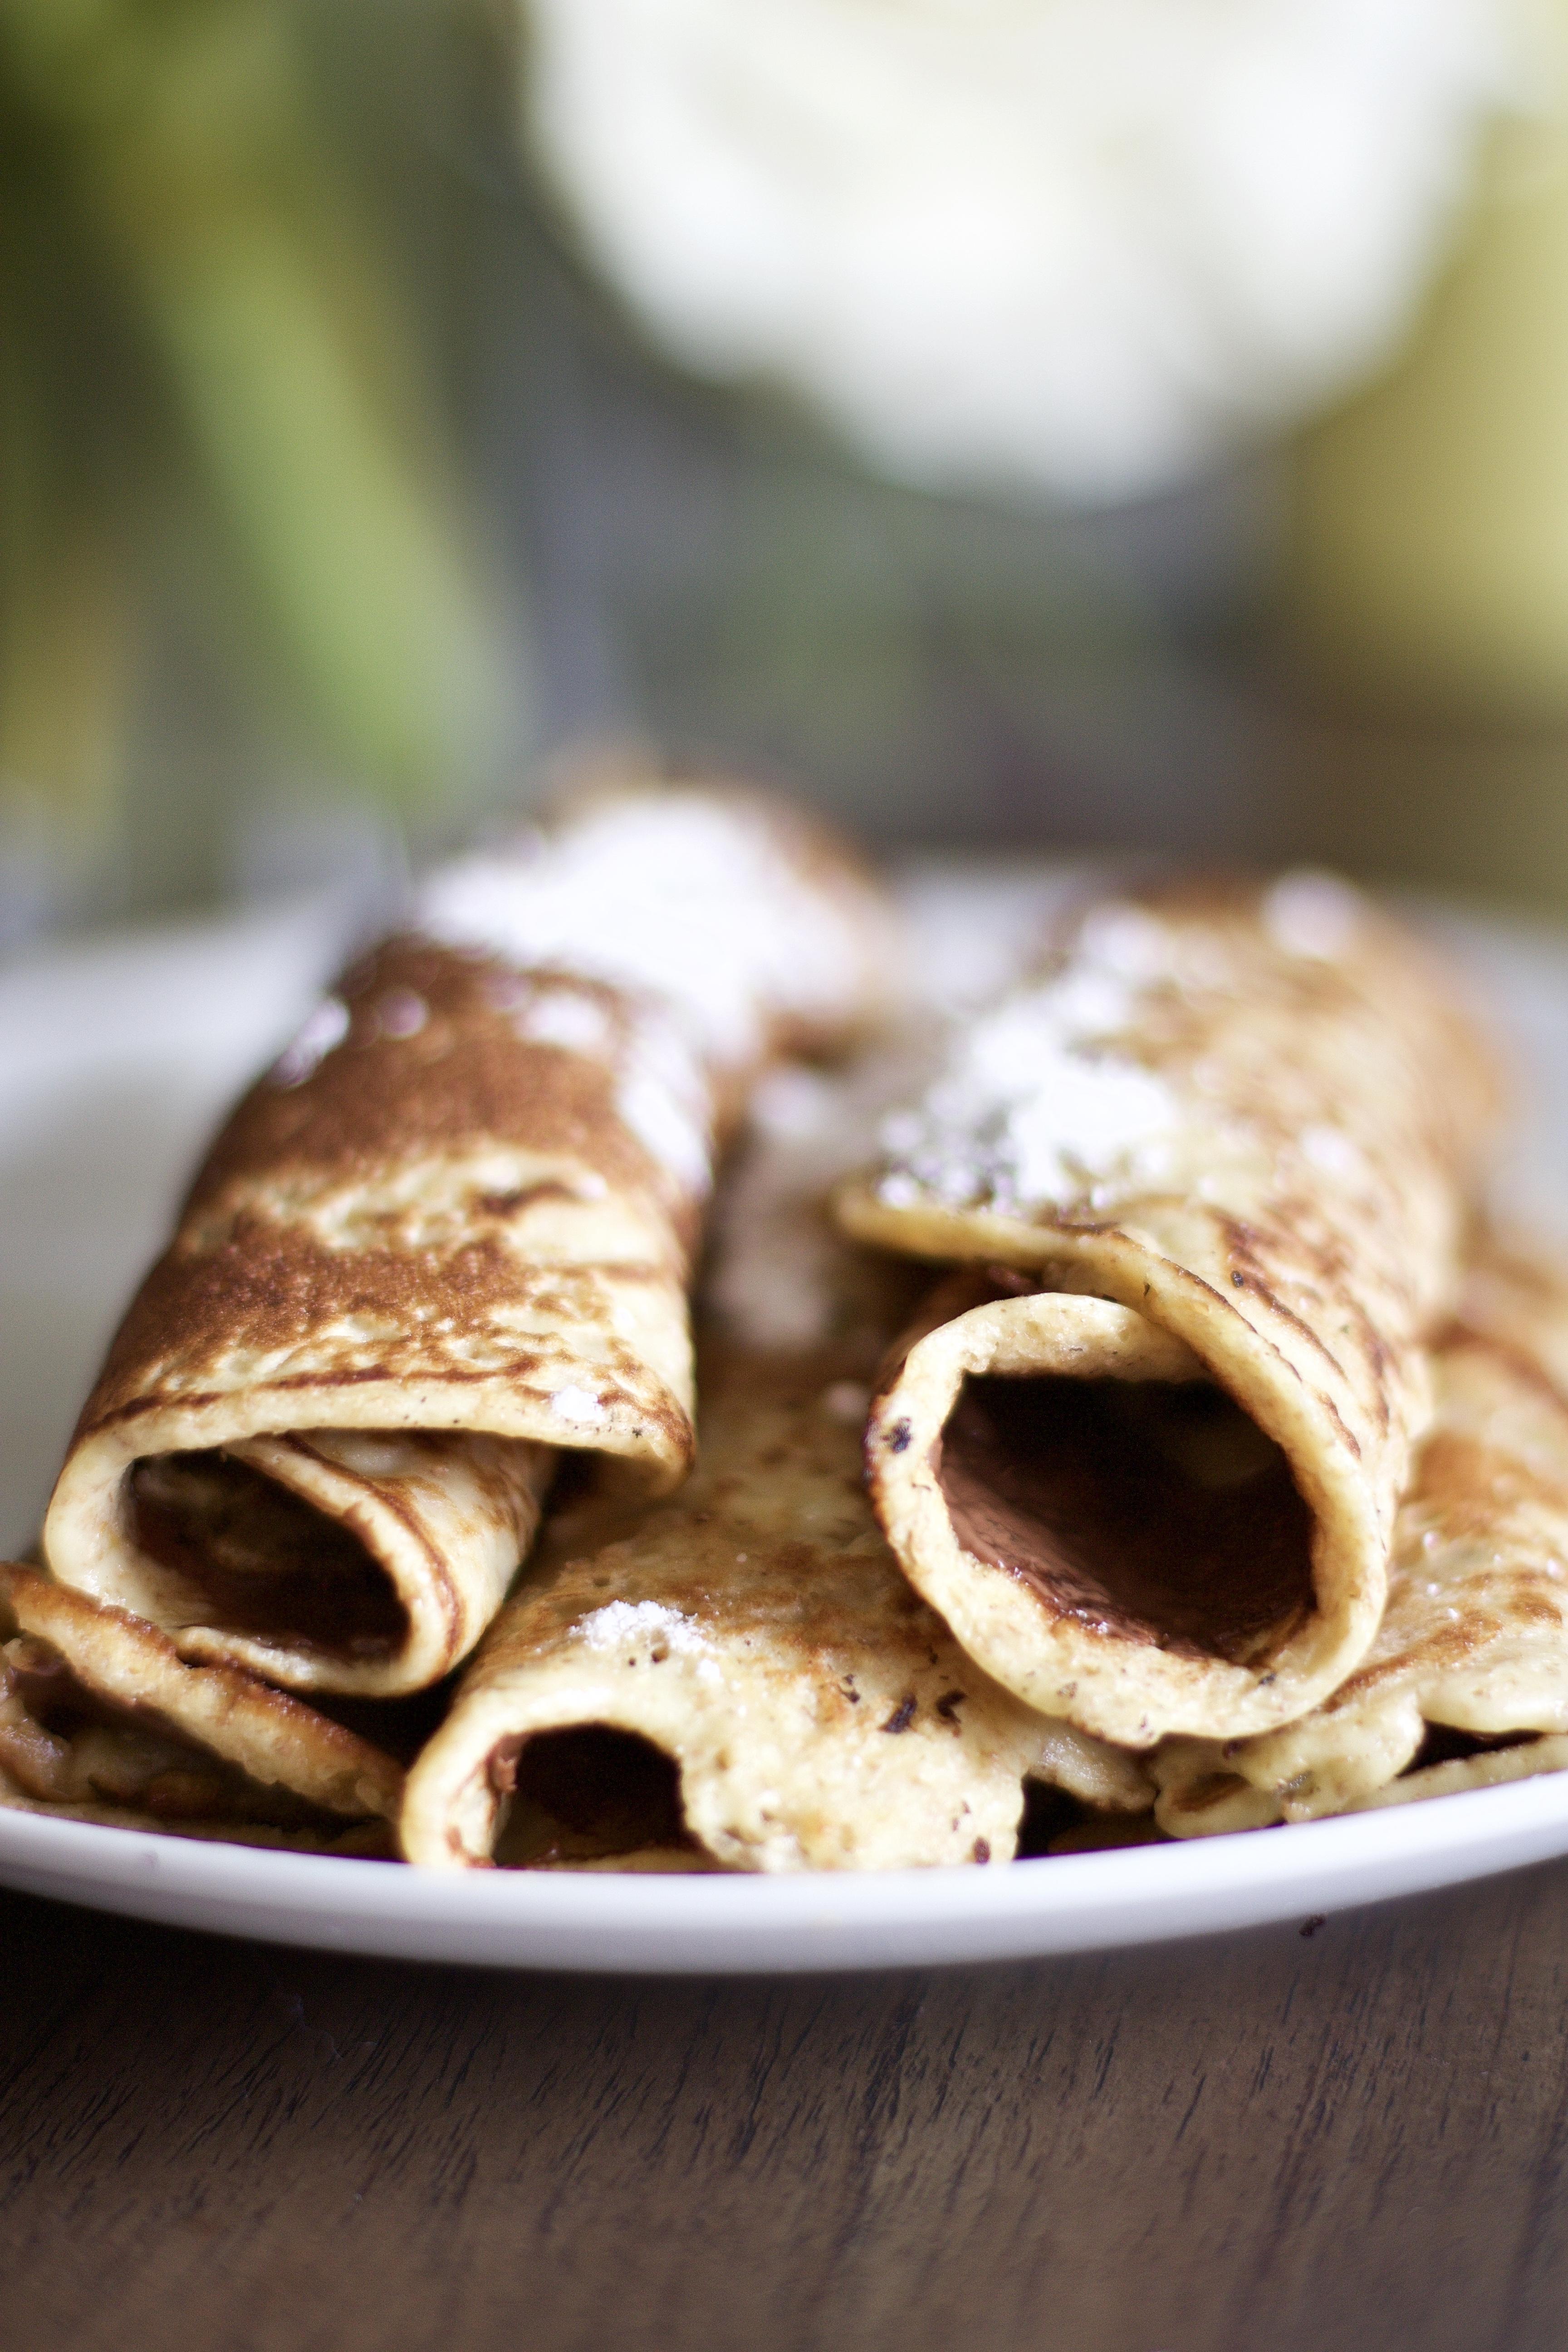 Gluten-Free Nutella Crepes